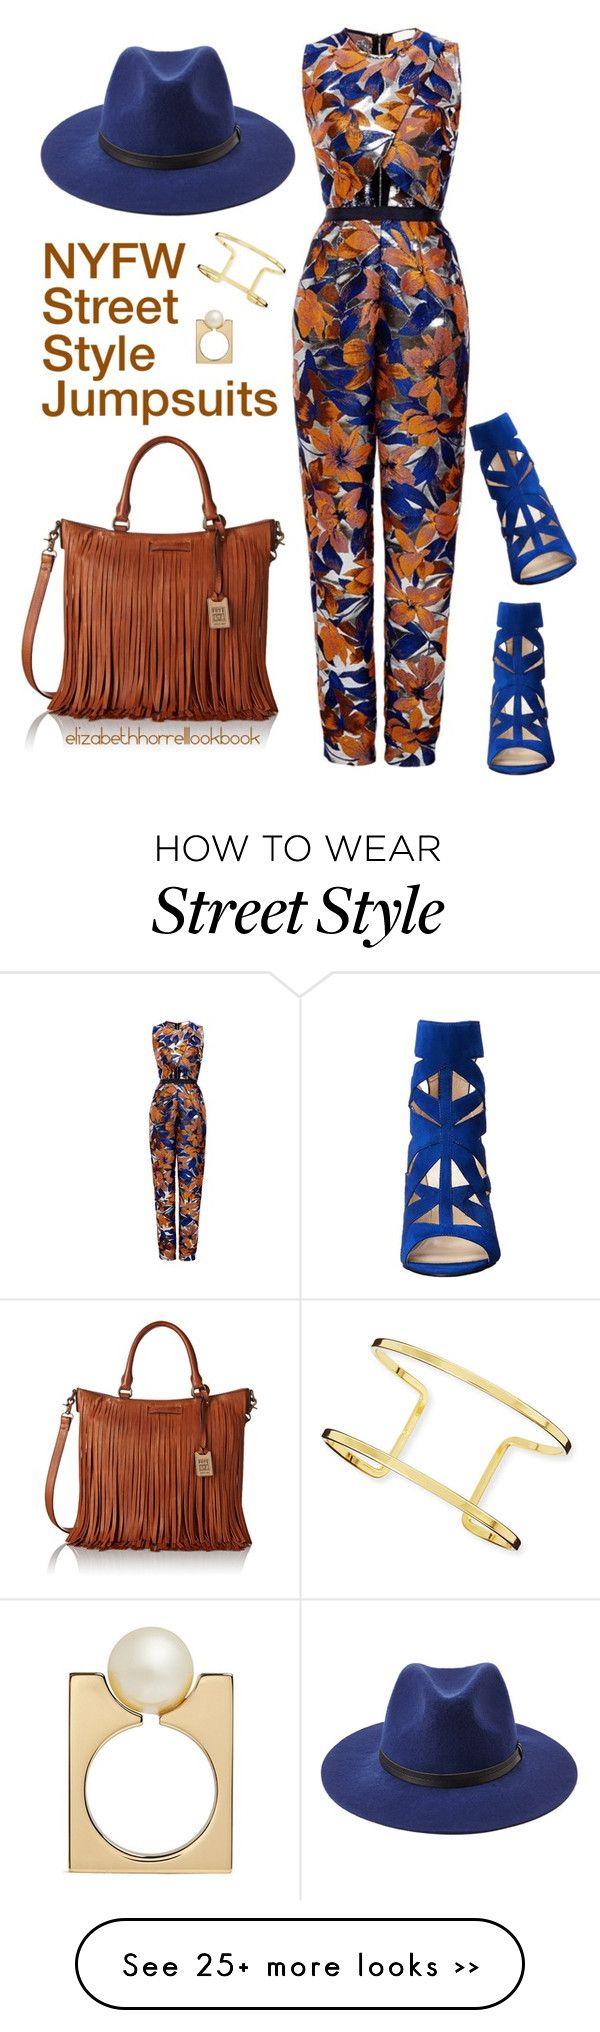 """NYFW Street Style Jumpsuits"" by elizabethhorrell on Polyvore featuring moda, Kaelen, Forever 21, Nine West, Frye, Jules Smith e Chloé"